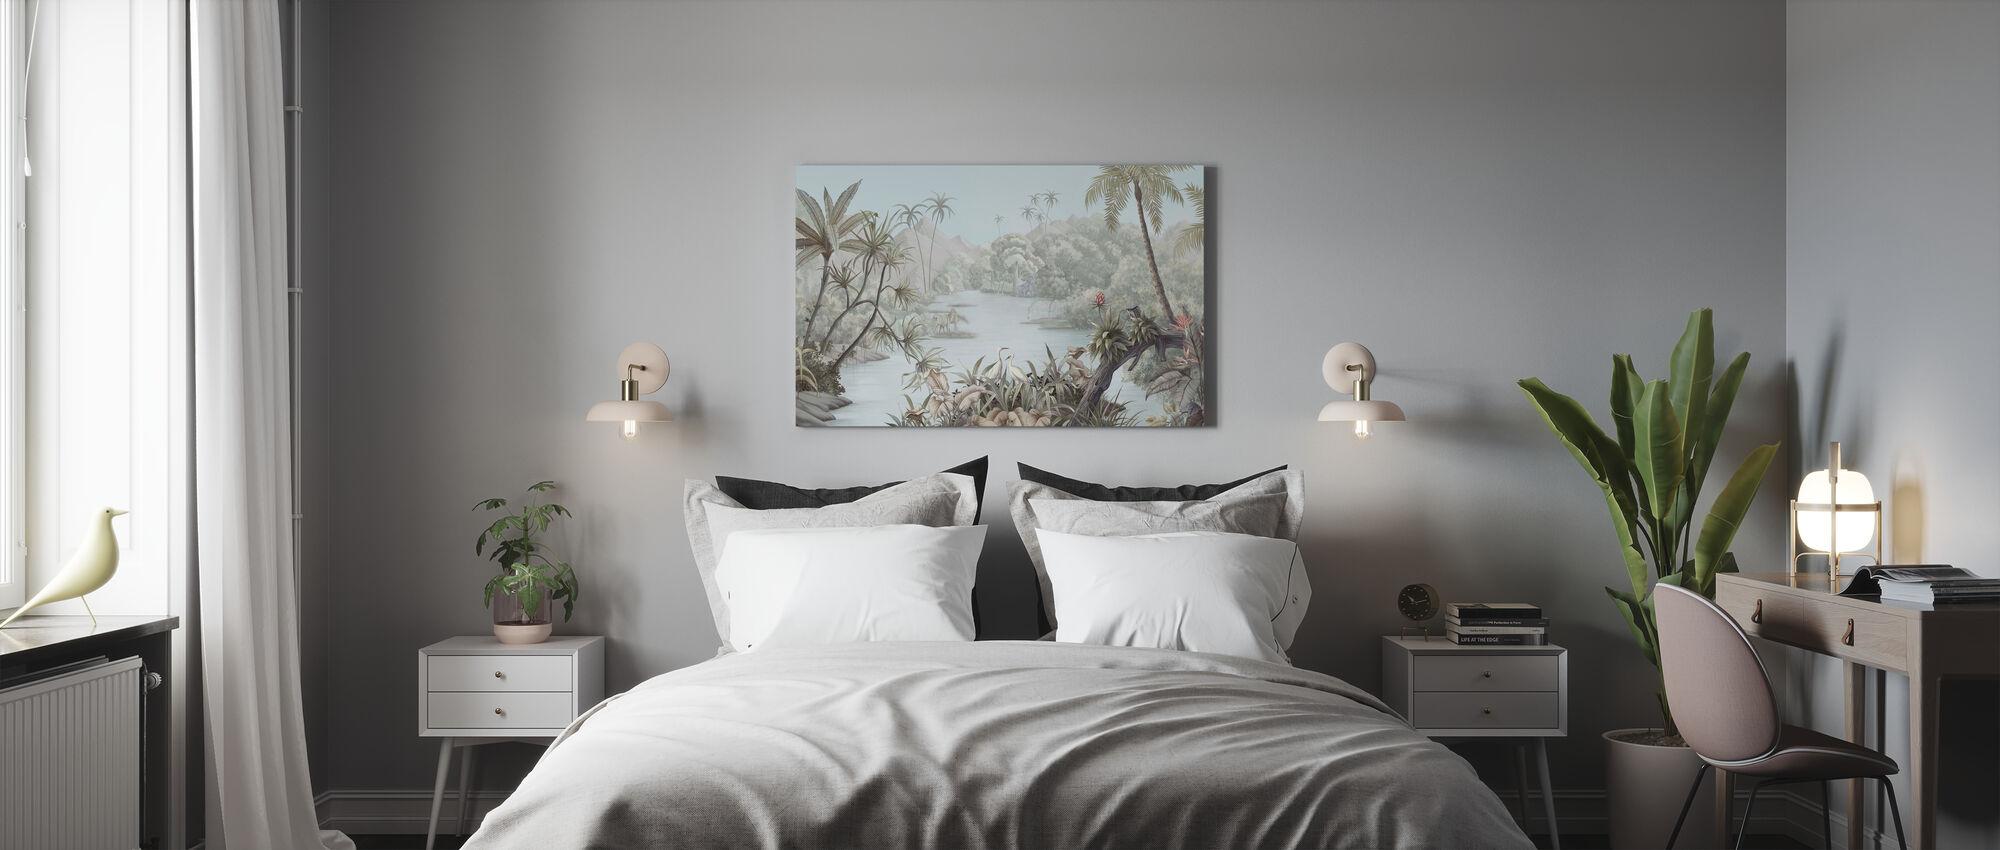 Tangled Jungle II - Canvas print - Bedroom